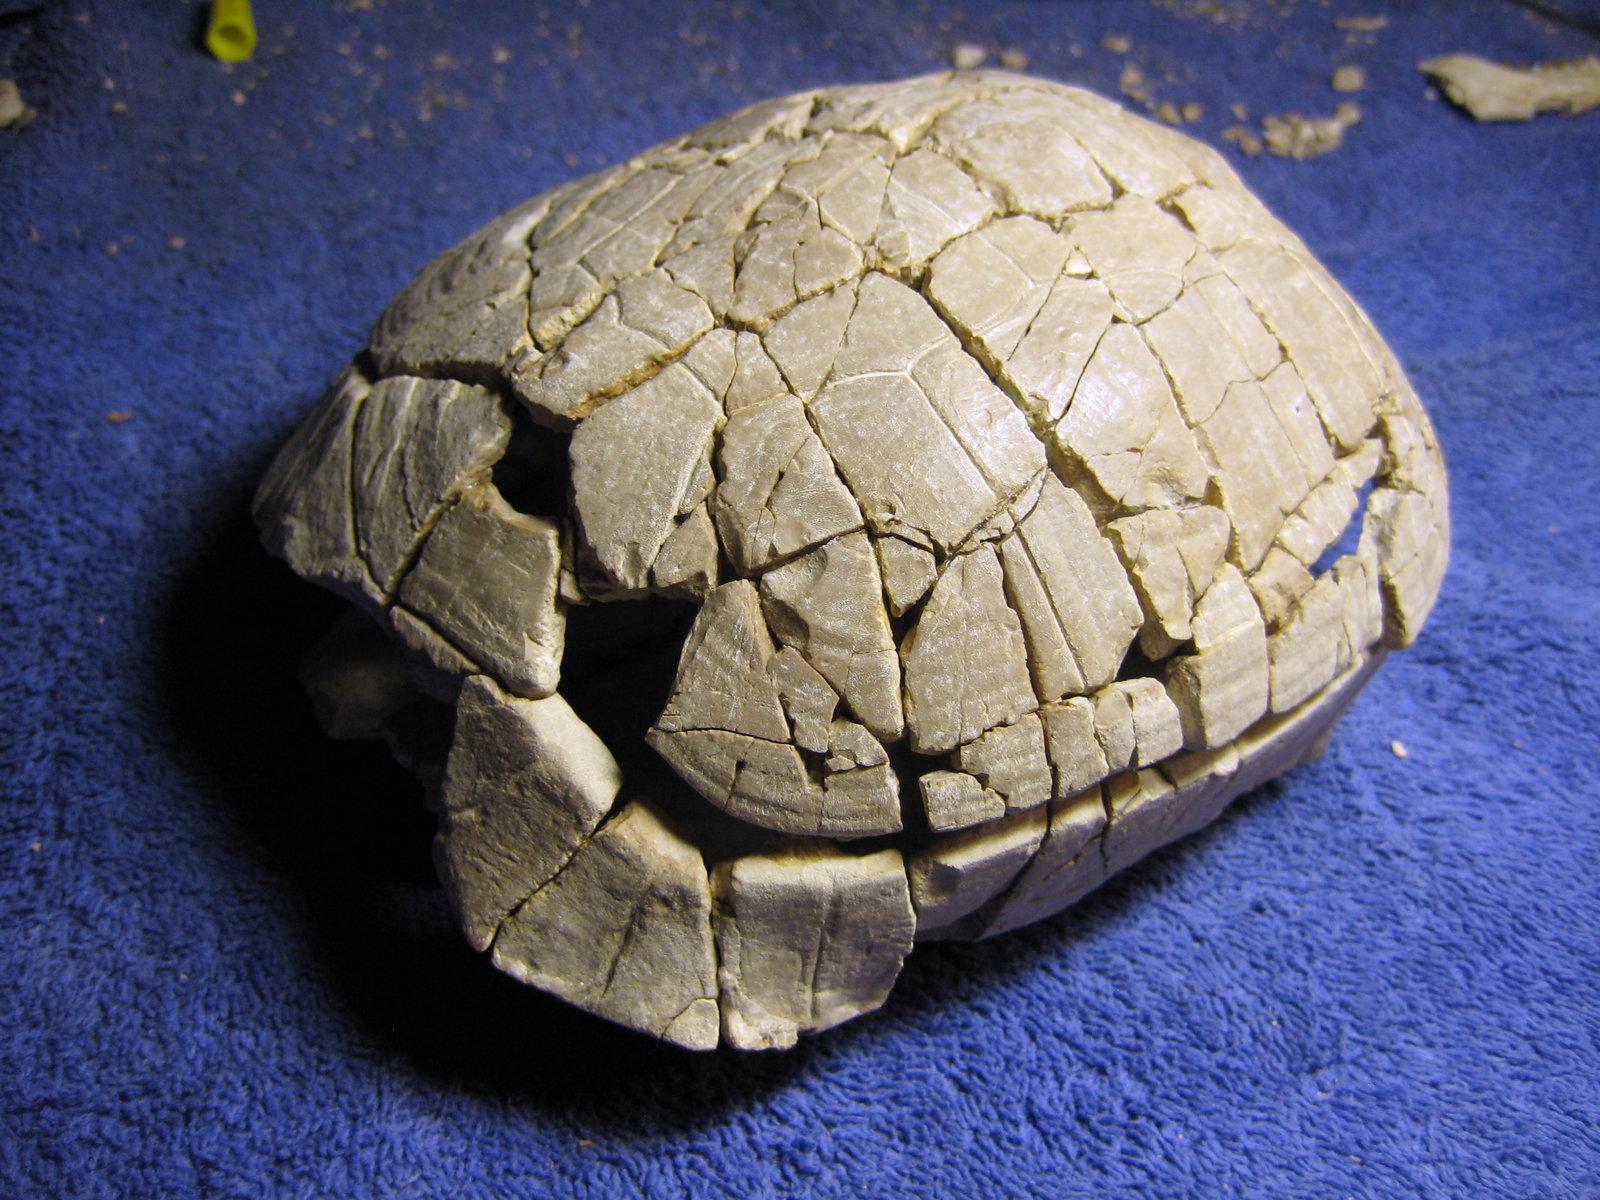 Stylemes nebraskensis Turtle - Nebraska Oligicene